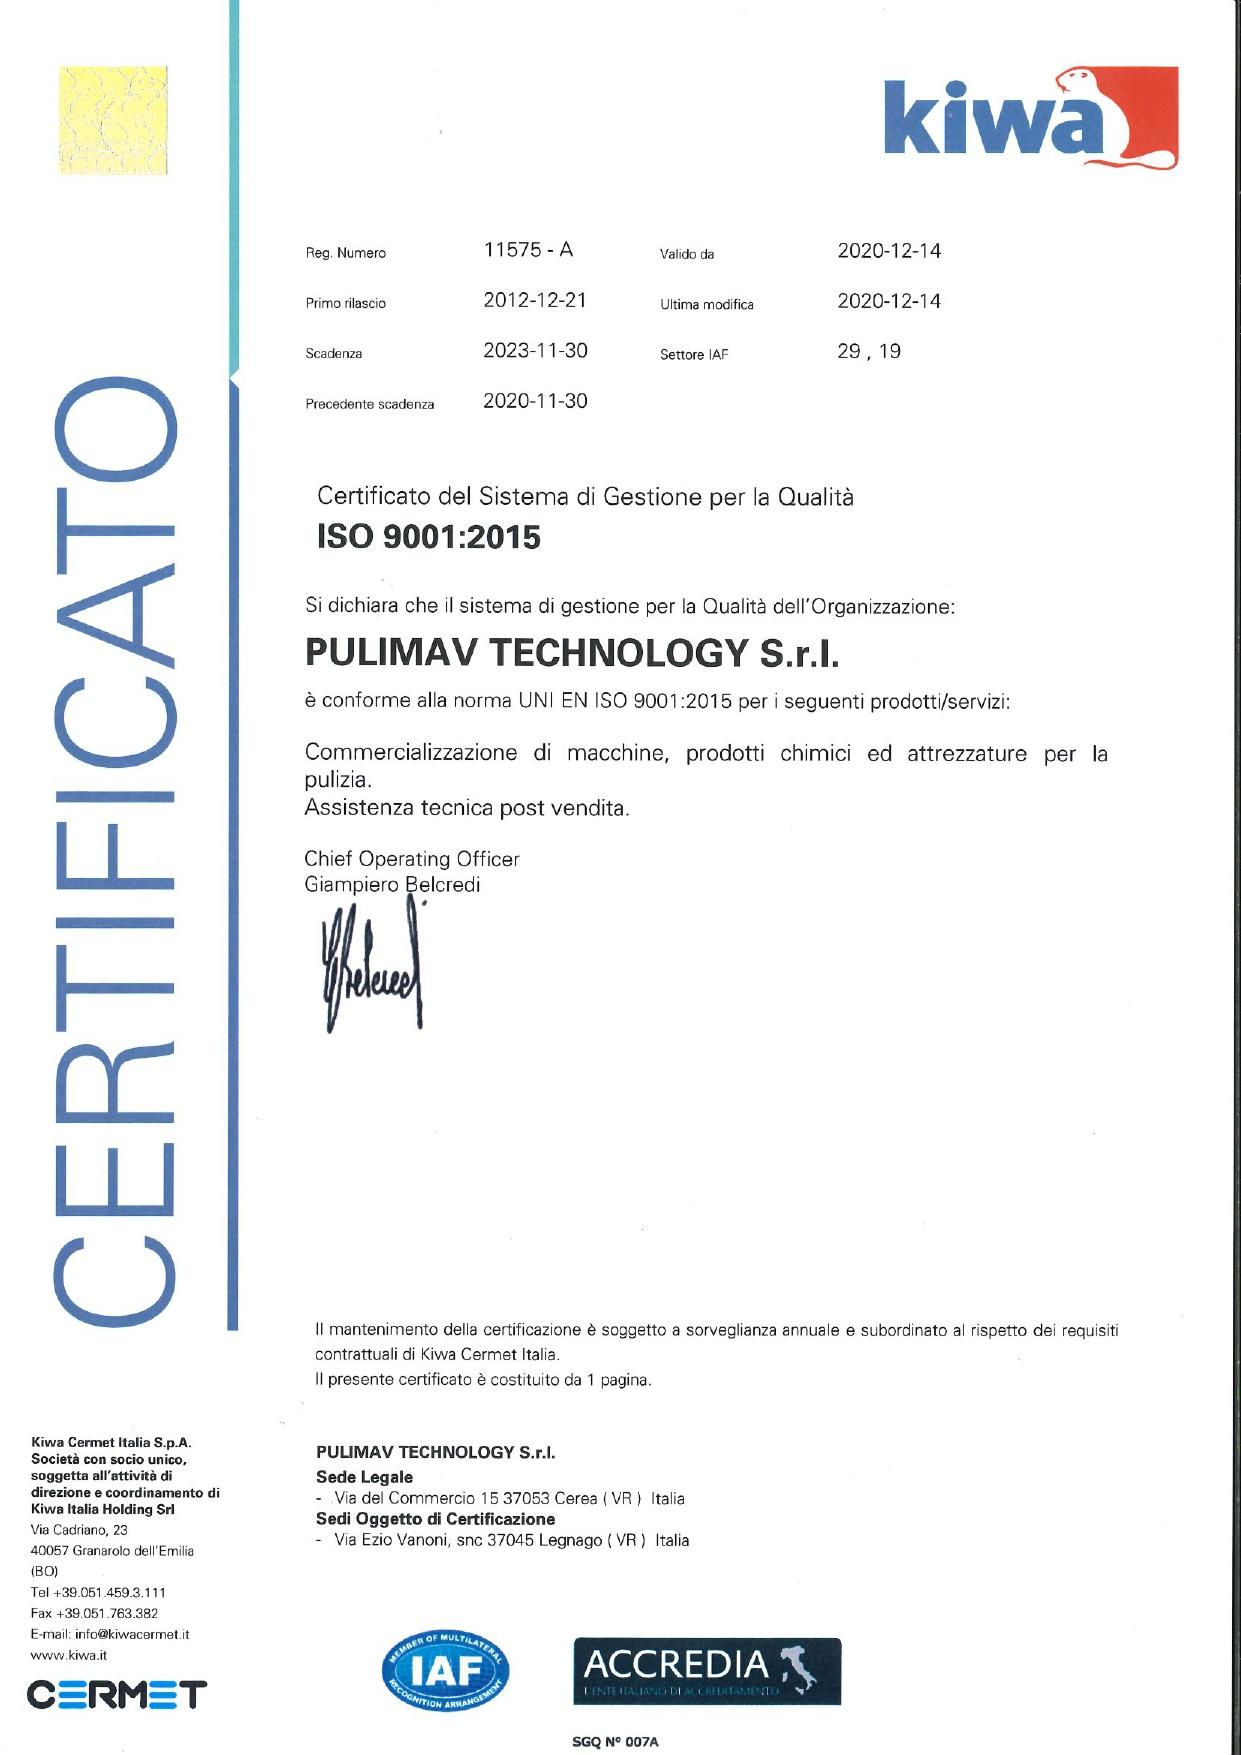 ISO 9001:2015- Pulimav